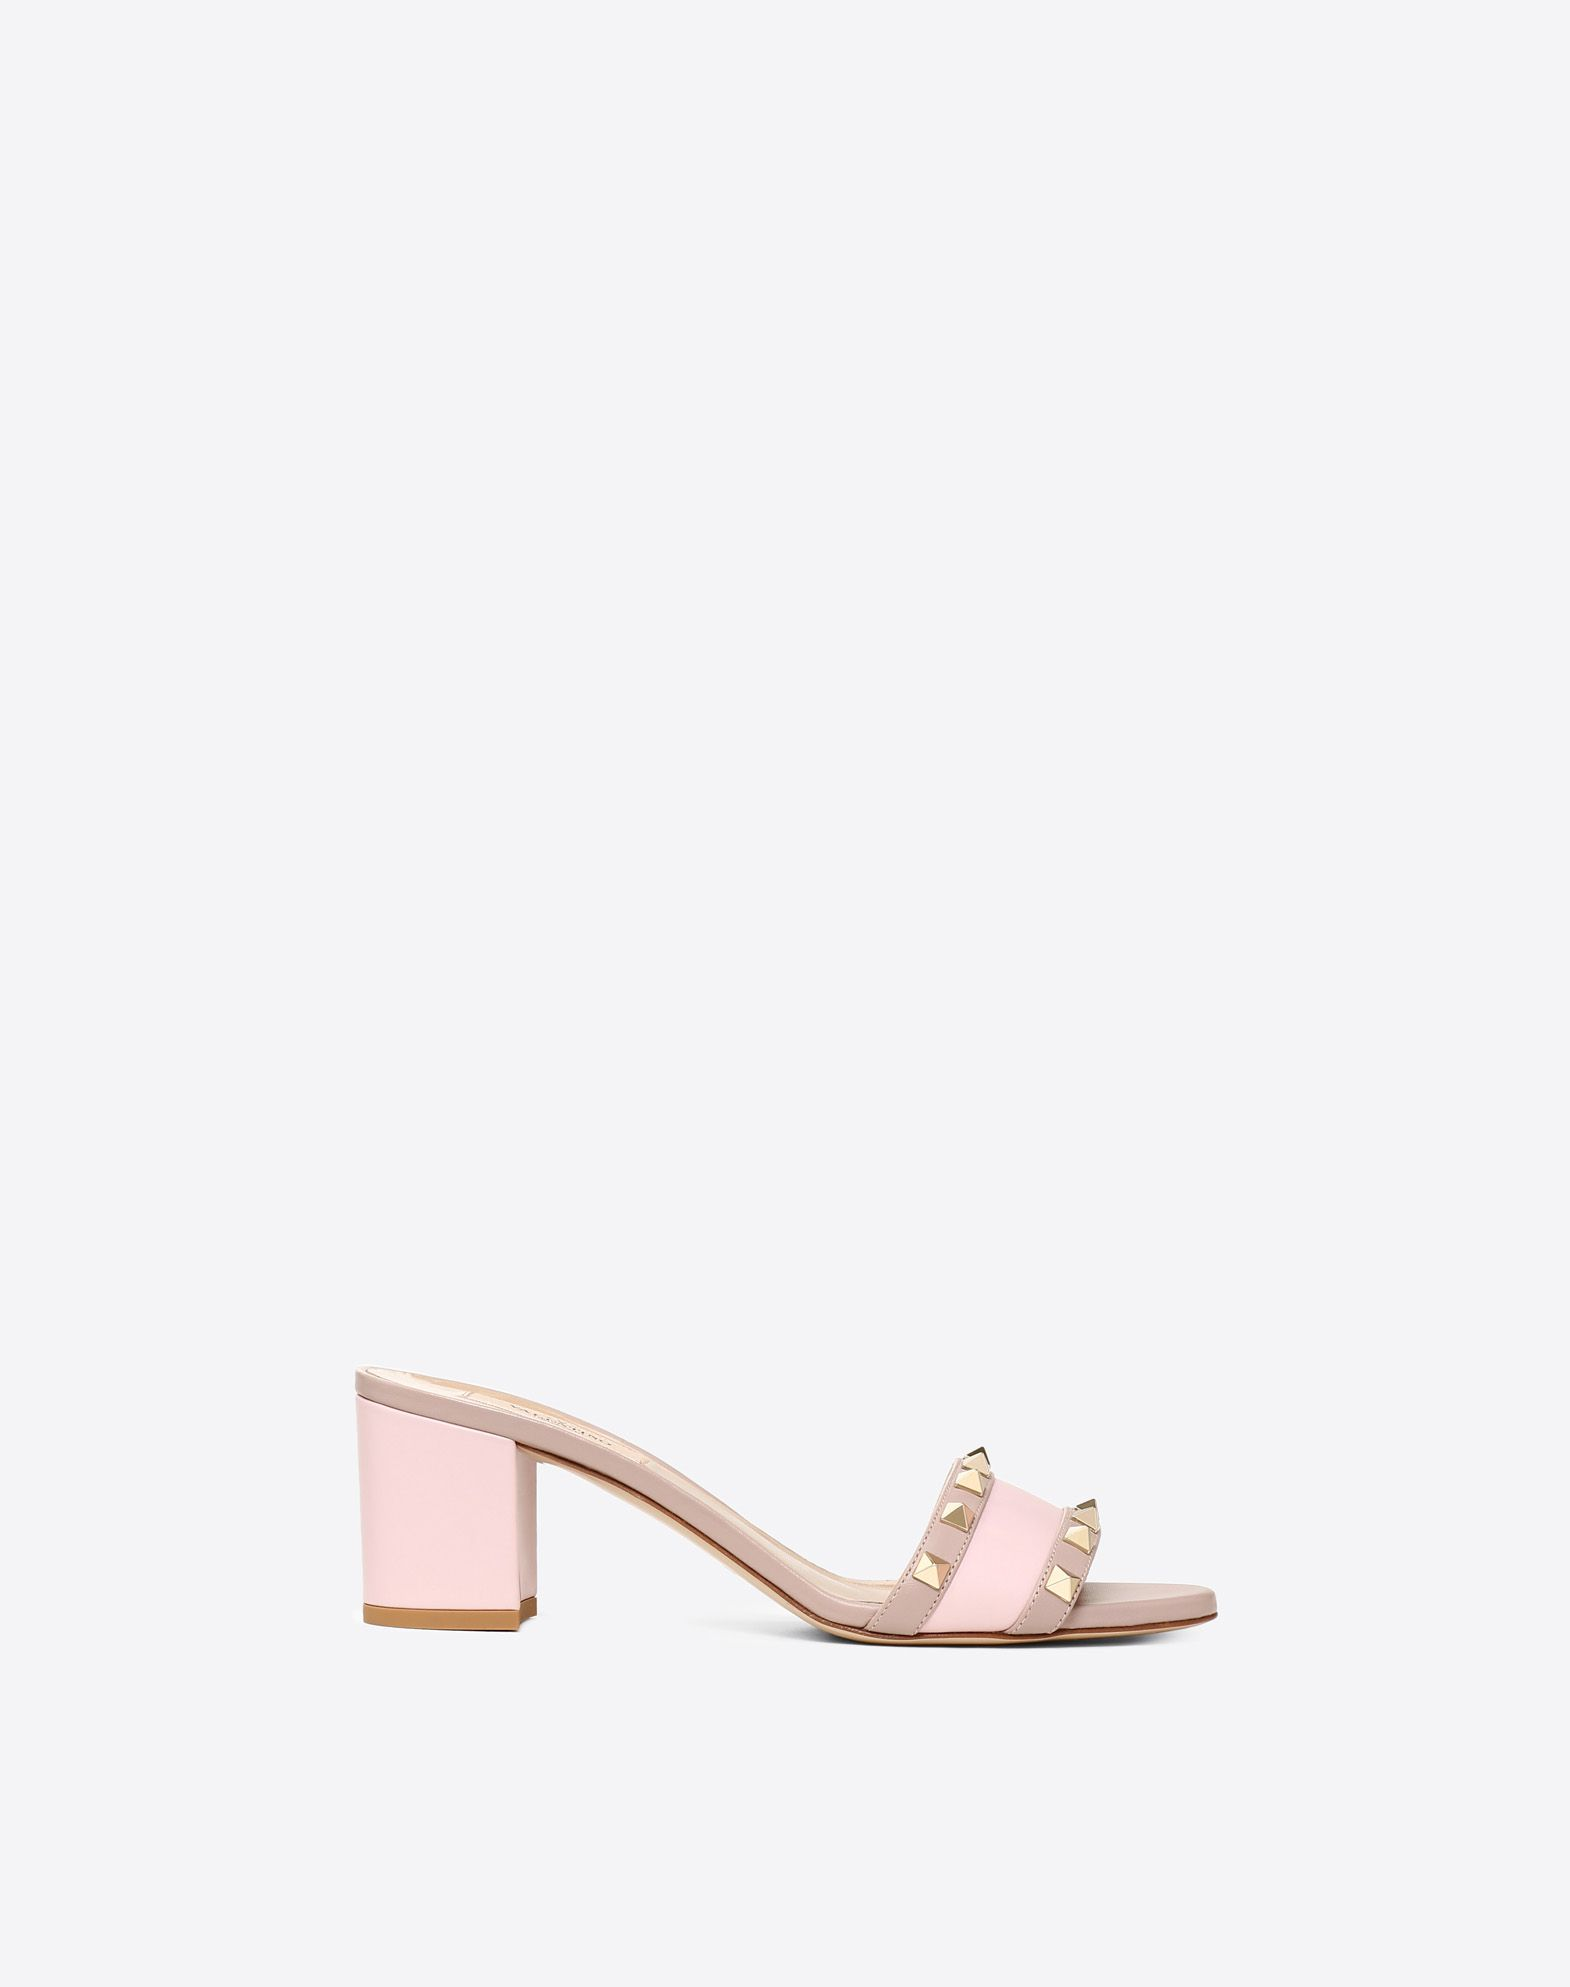 VALENTINO Studs Leather sole Round toeline Square heel  45409459ac